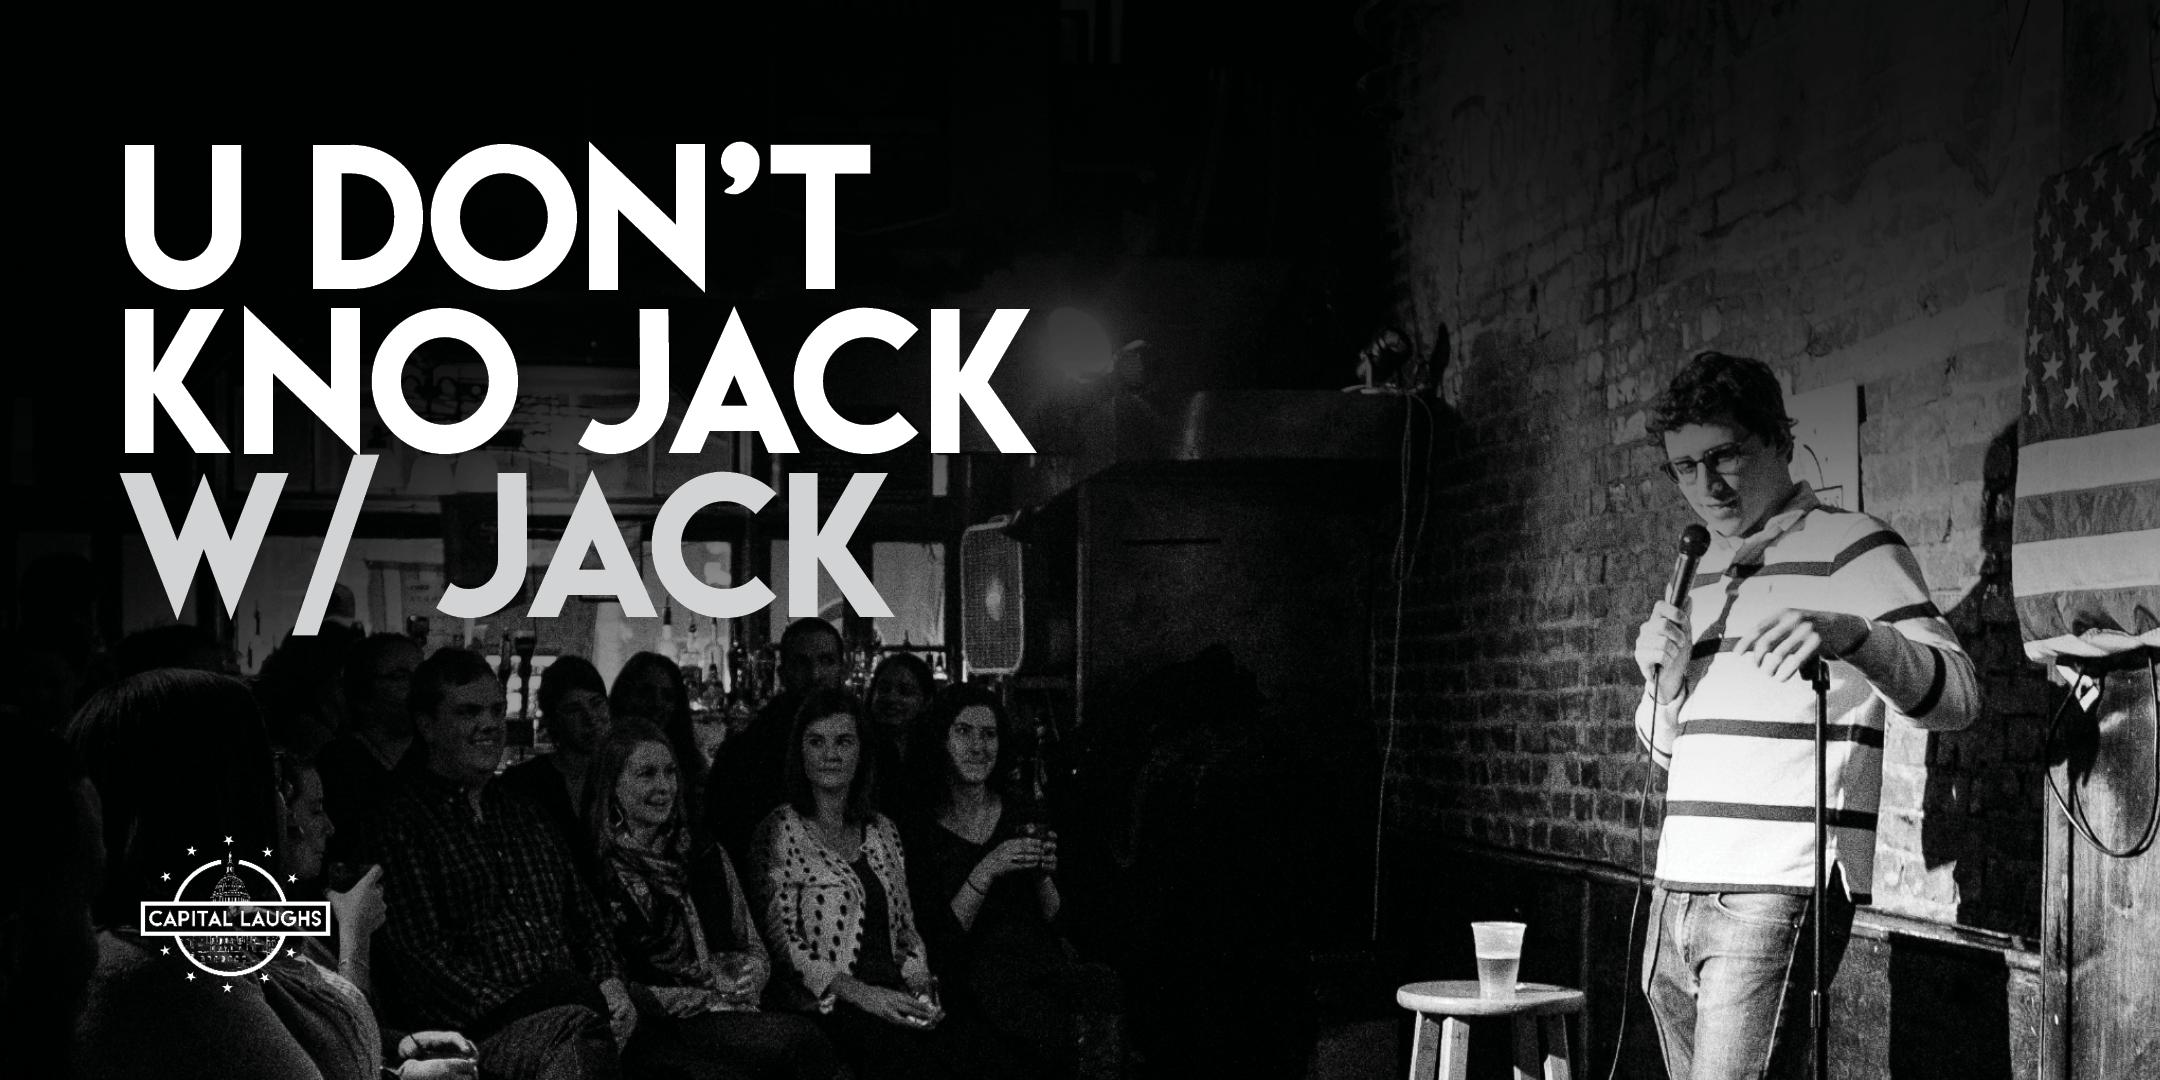 U Don't Know Jack w/ Jack (Stand-Up Comedy)